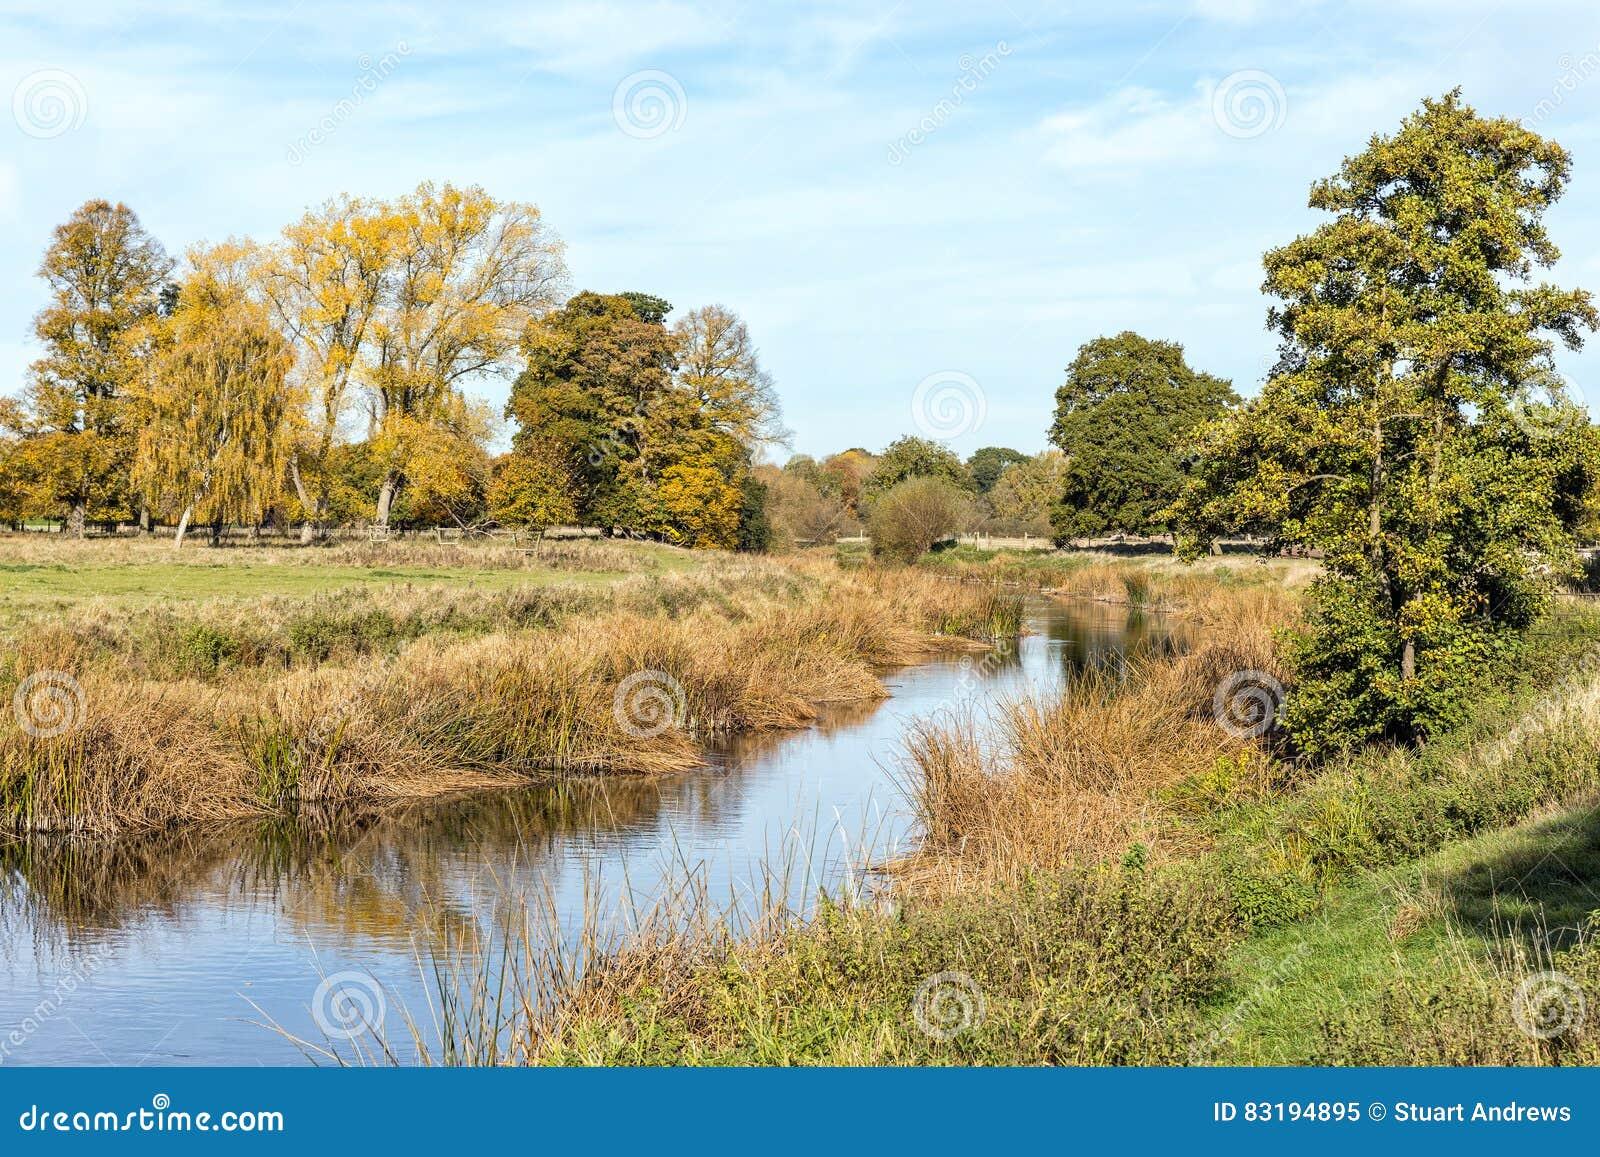 The Famous River Avon England